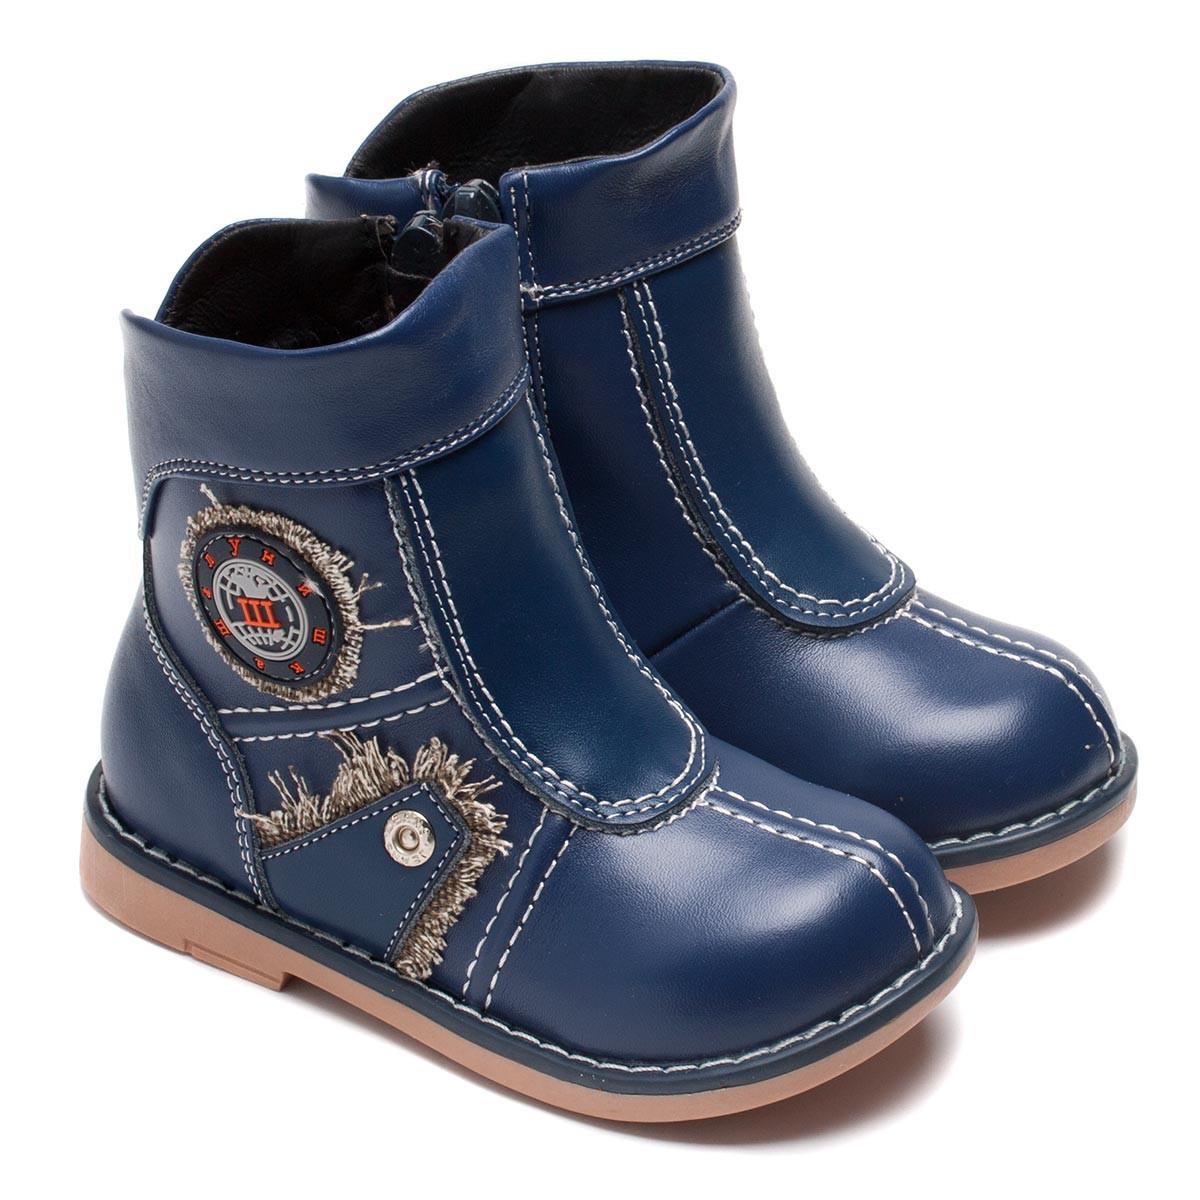 Ботинки Шалунишка для мальчика, на молнии, размер 20-25